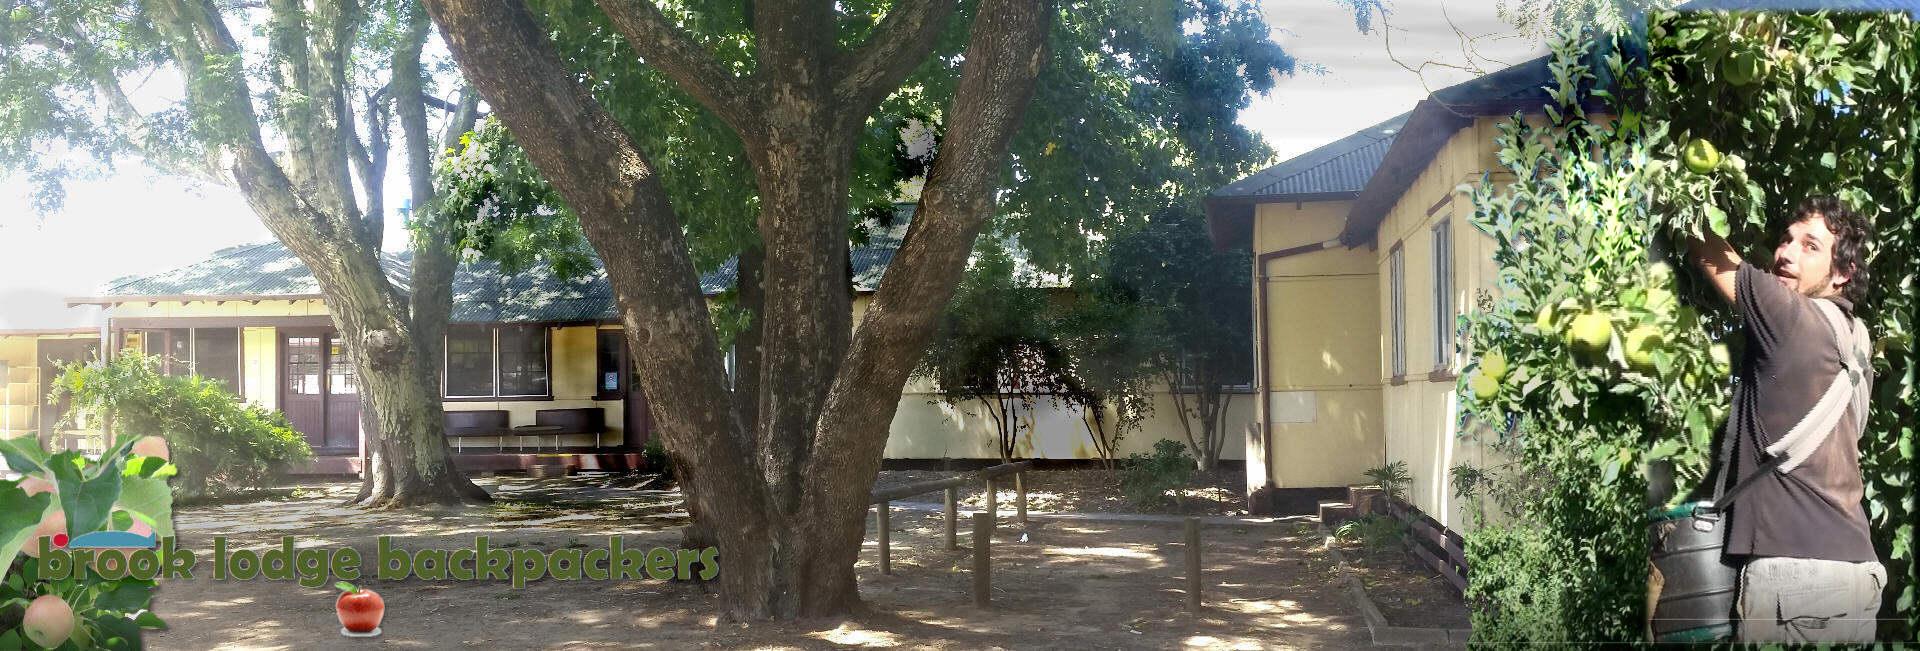 The 10 Best Hotels in Donnybrook, Western Australia $42 ...